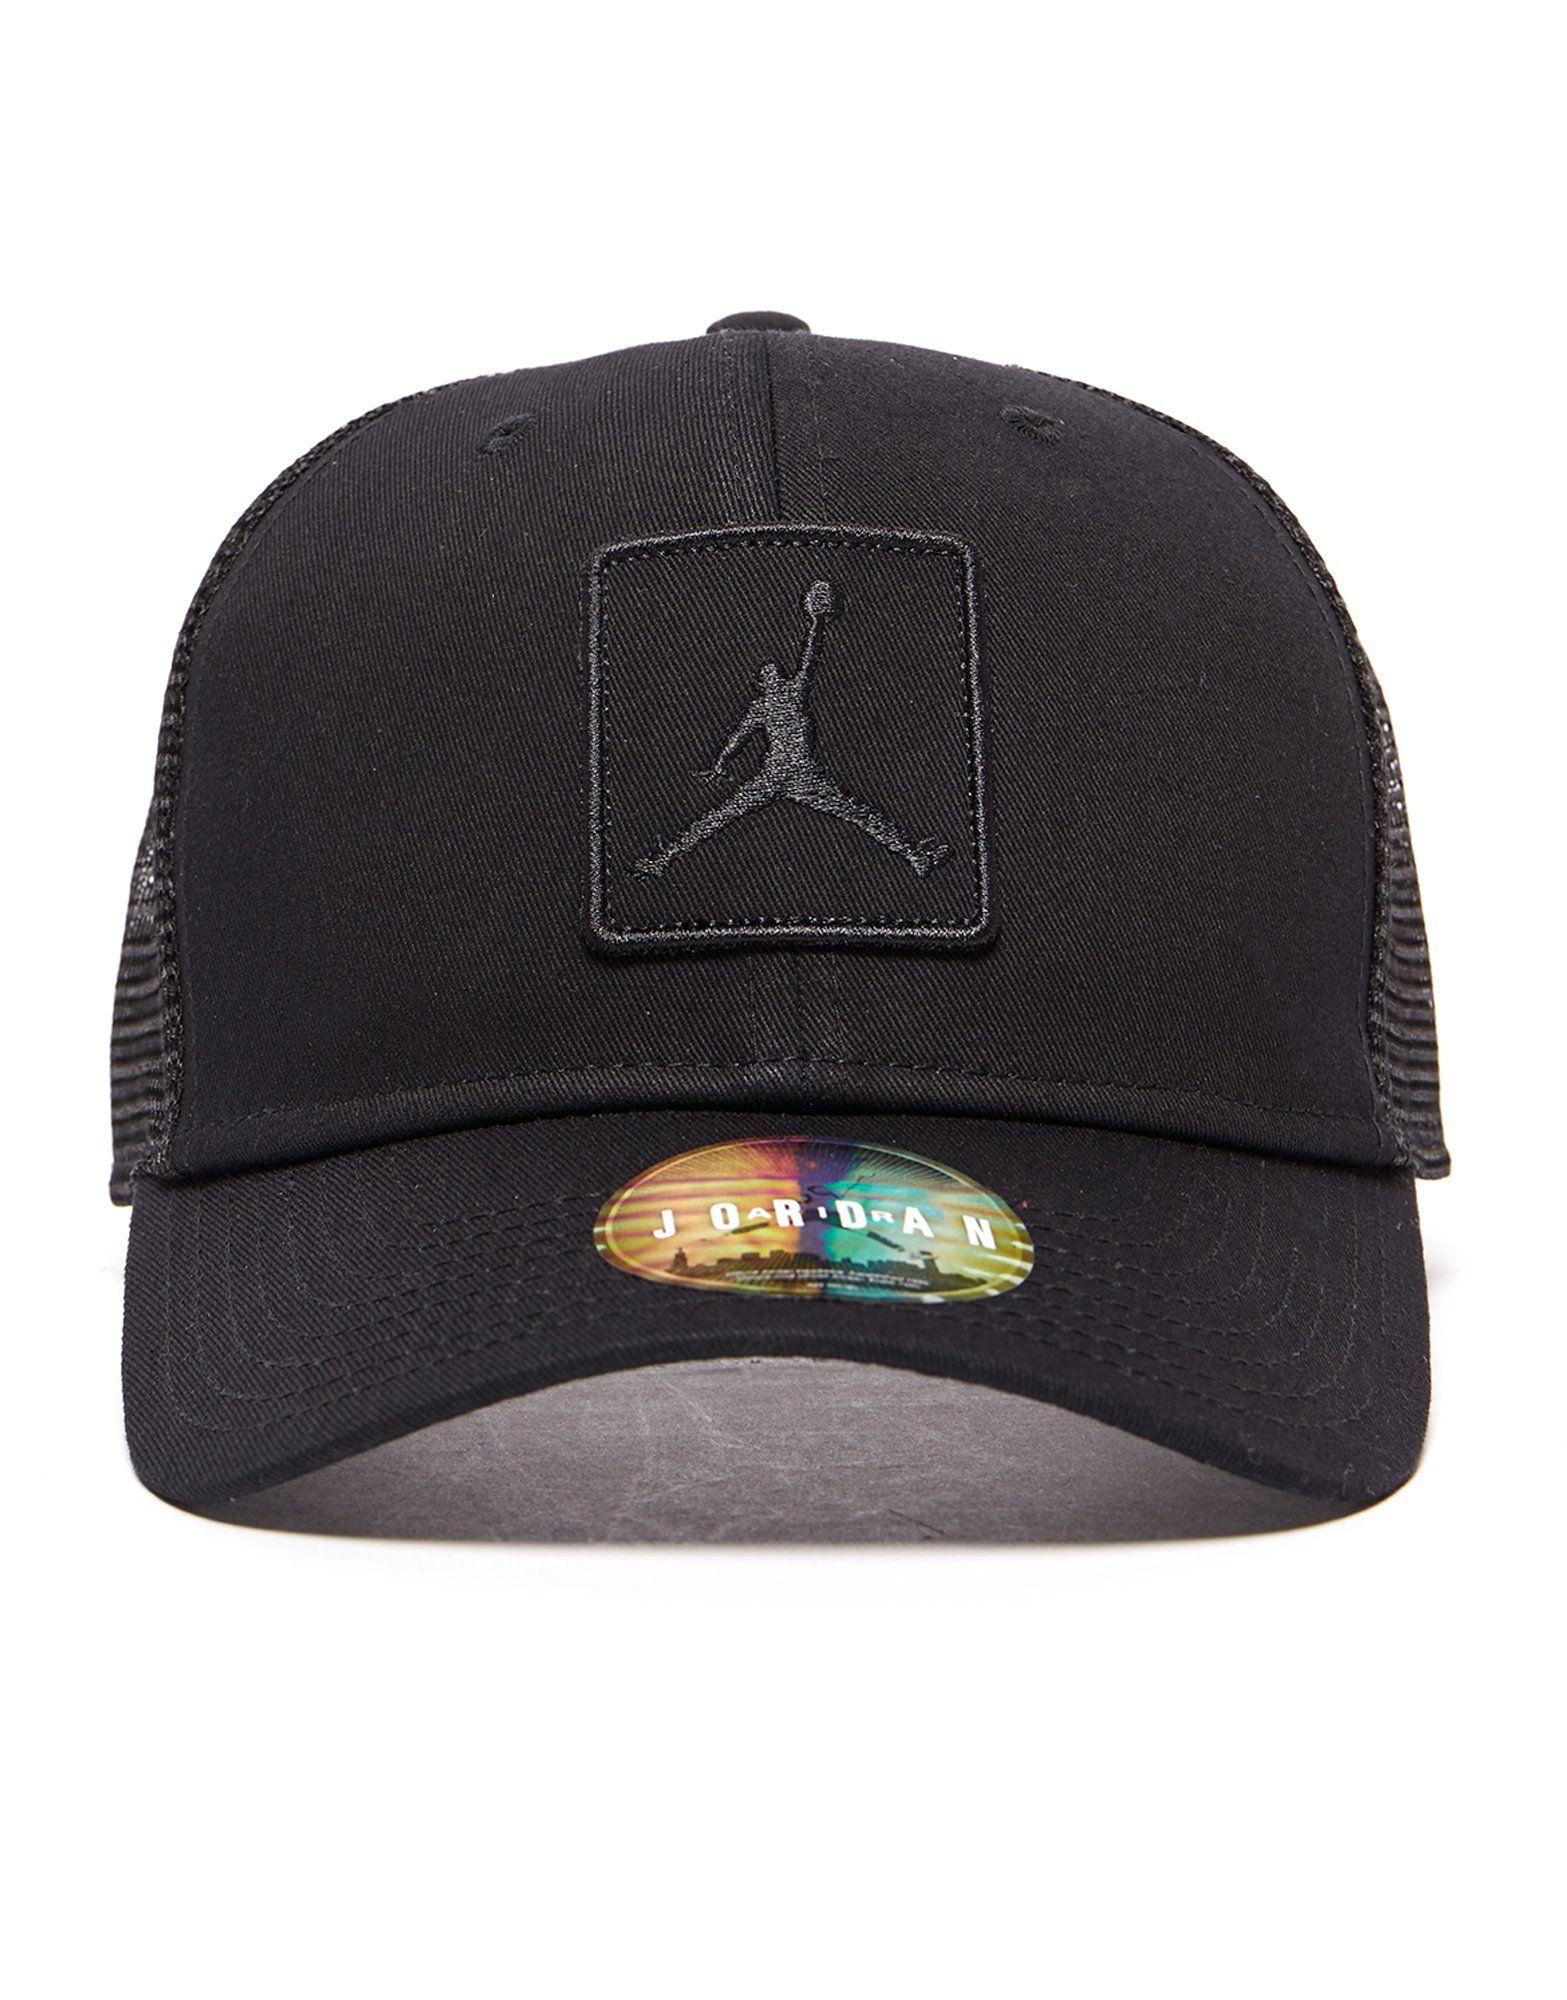 2176e9f717f3 Jordan Trucker Cap ...